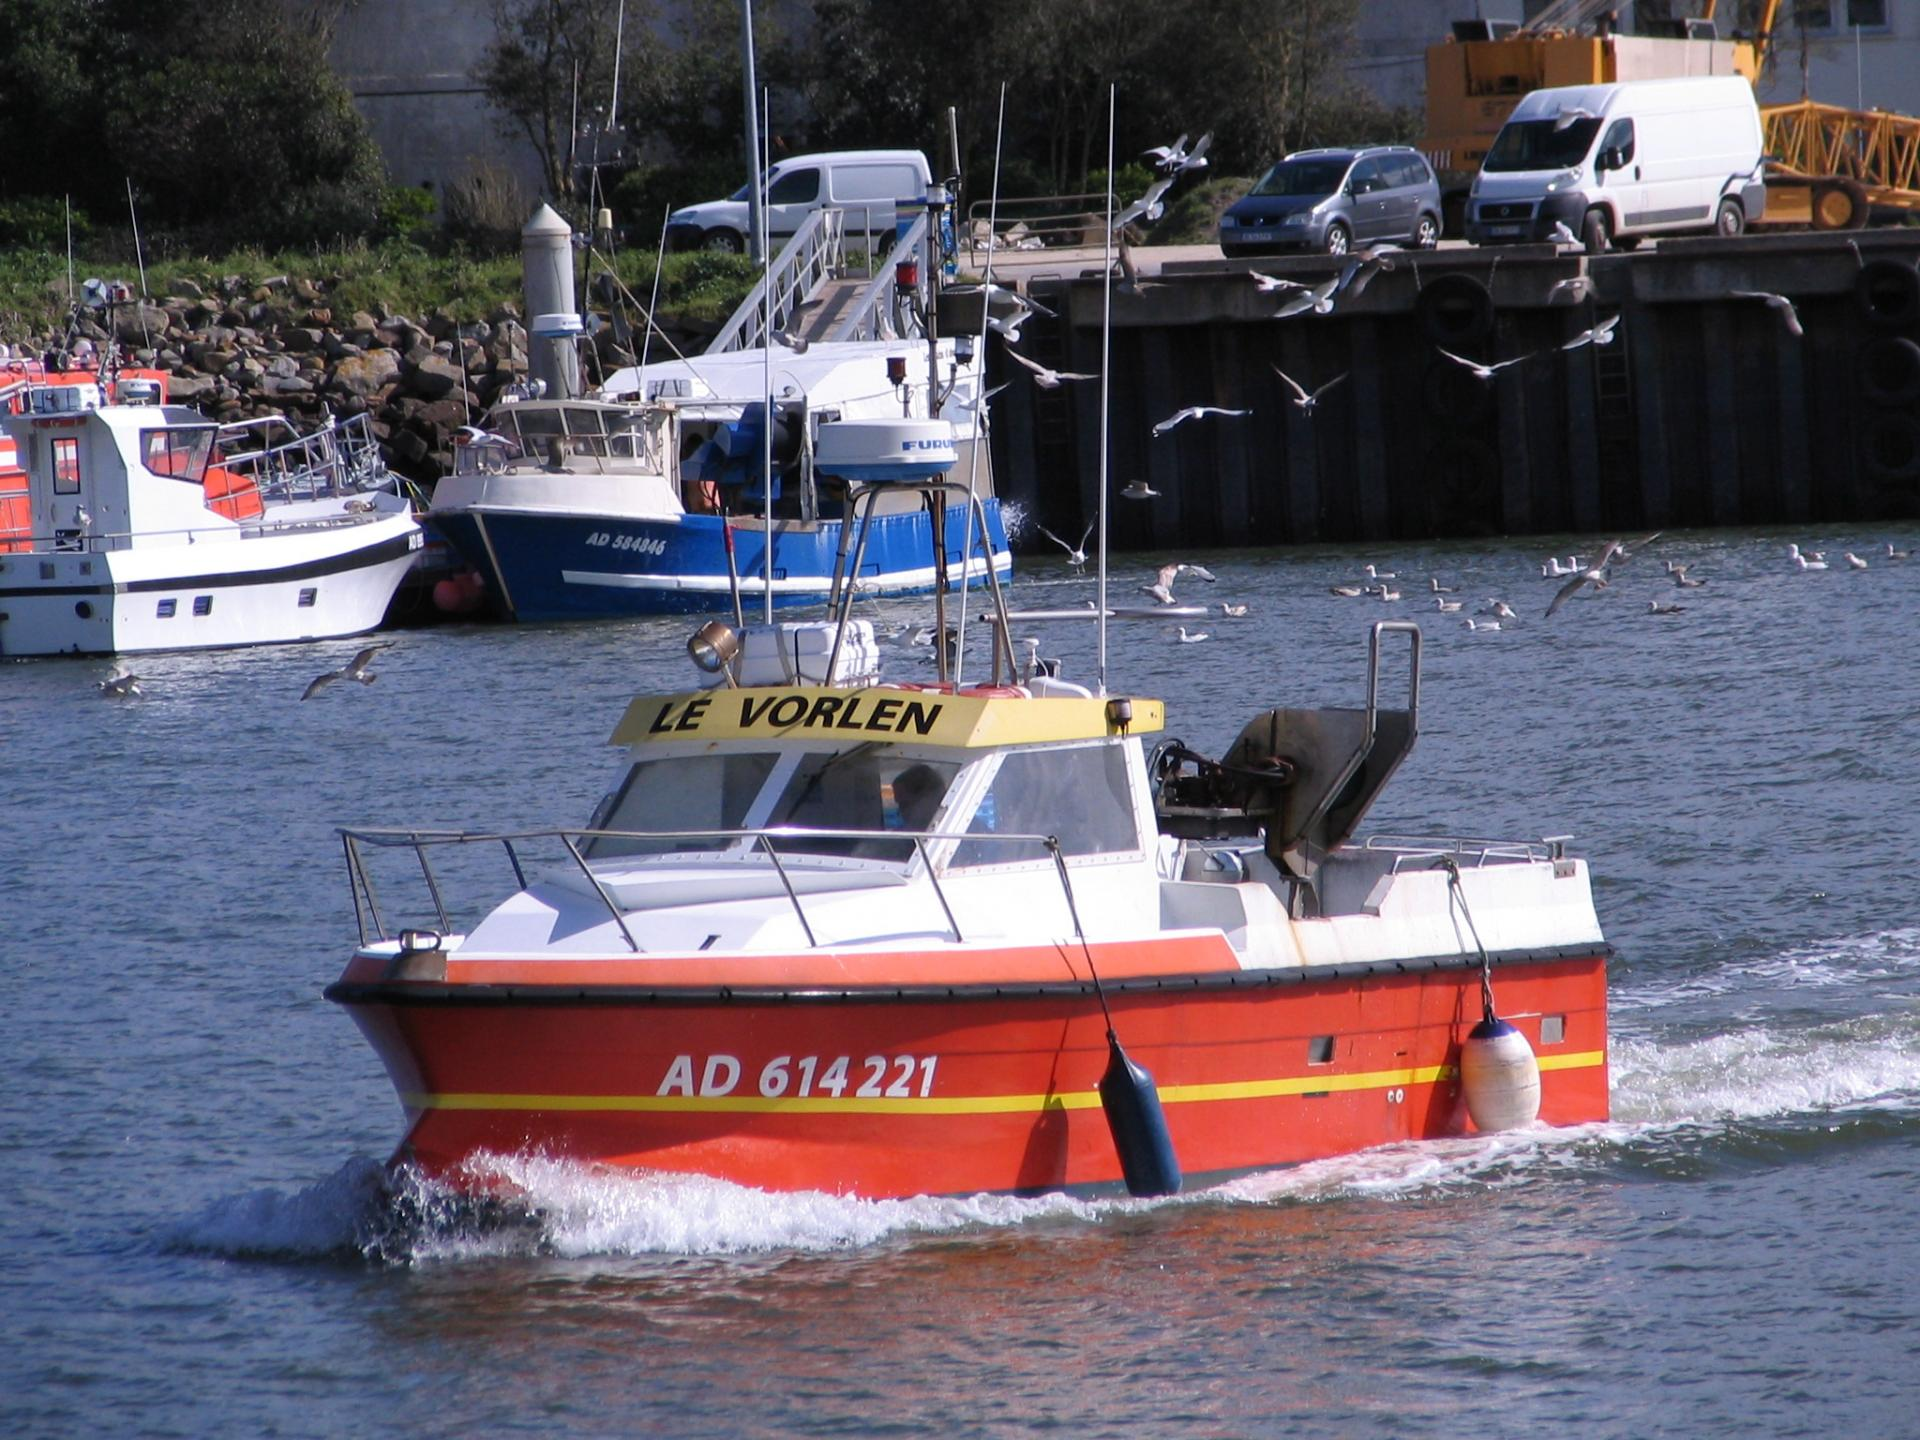 200316 le vorlen port c